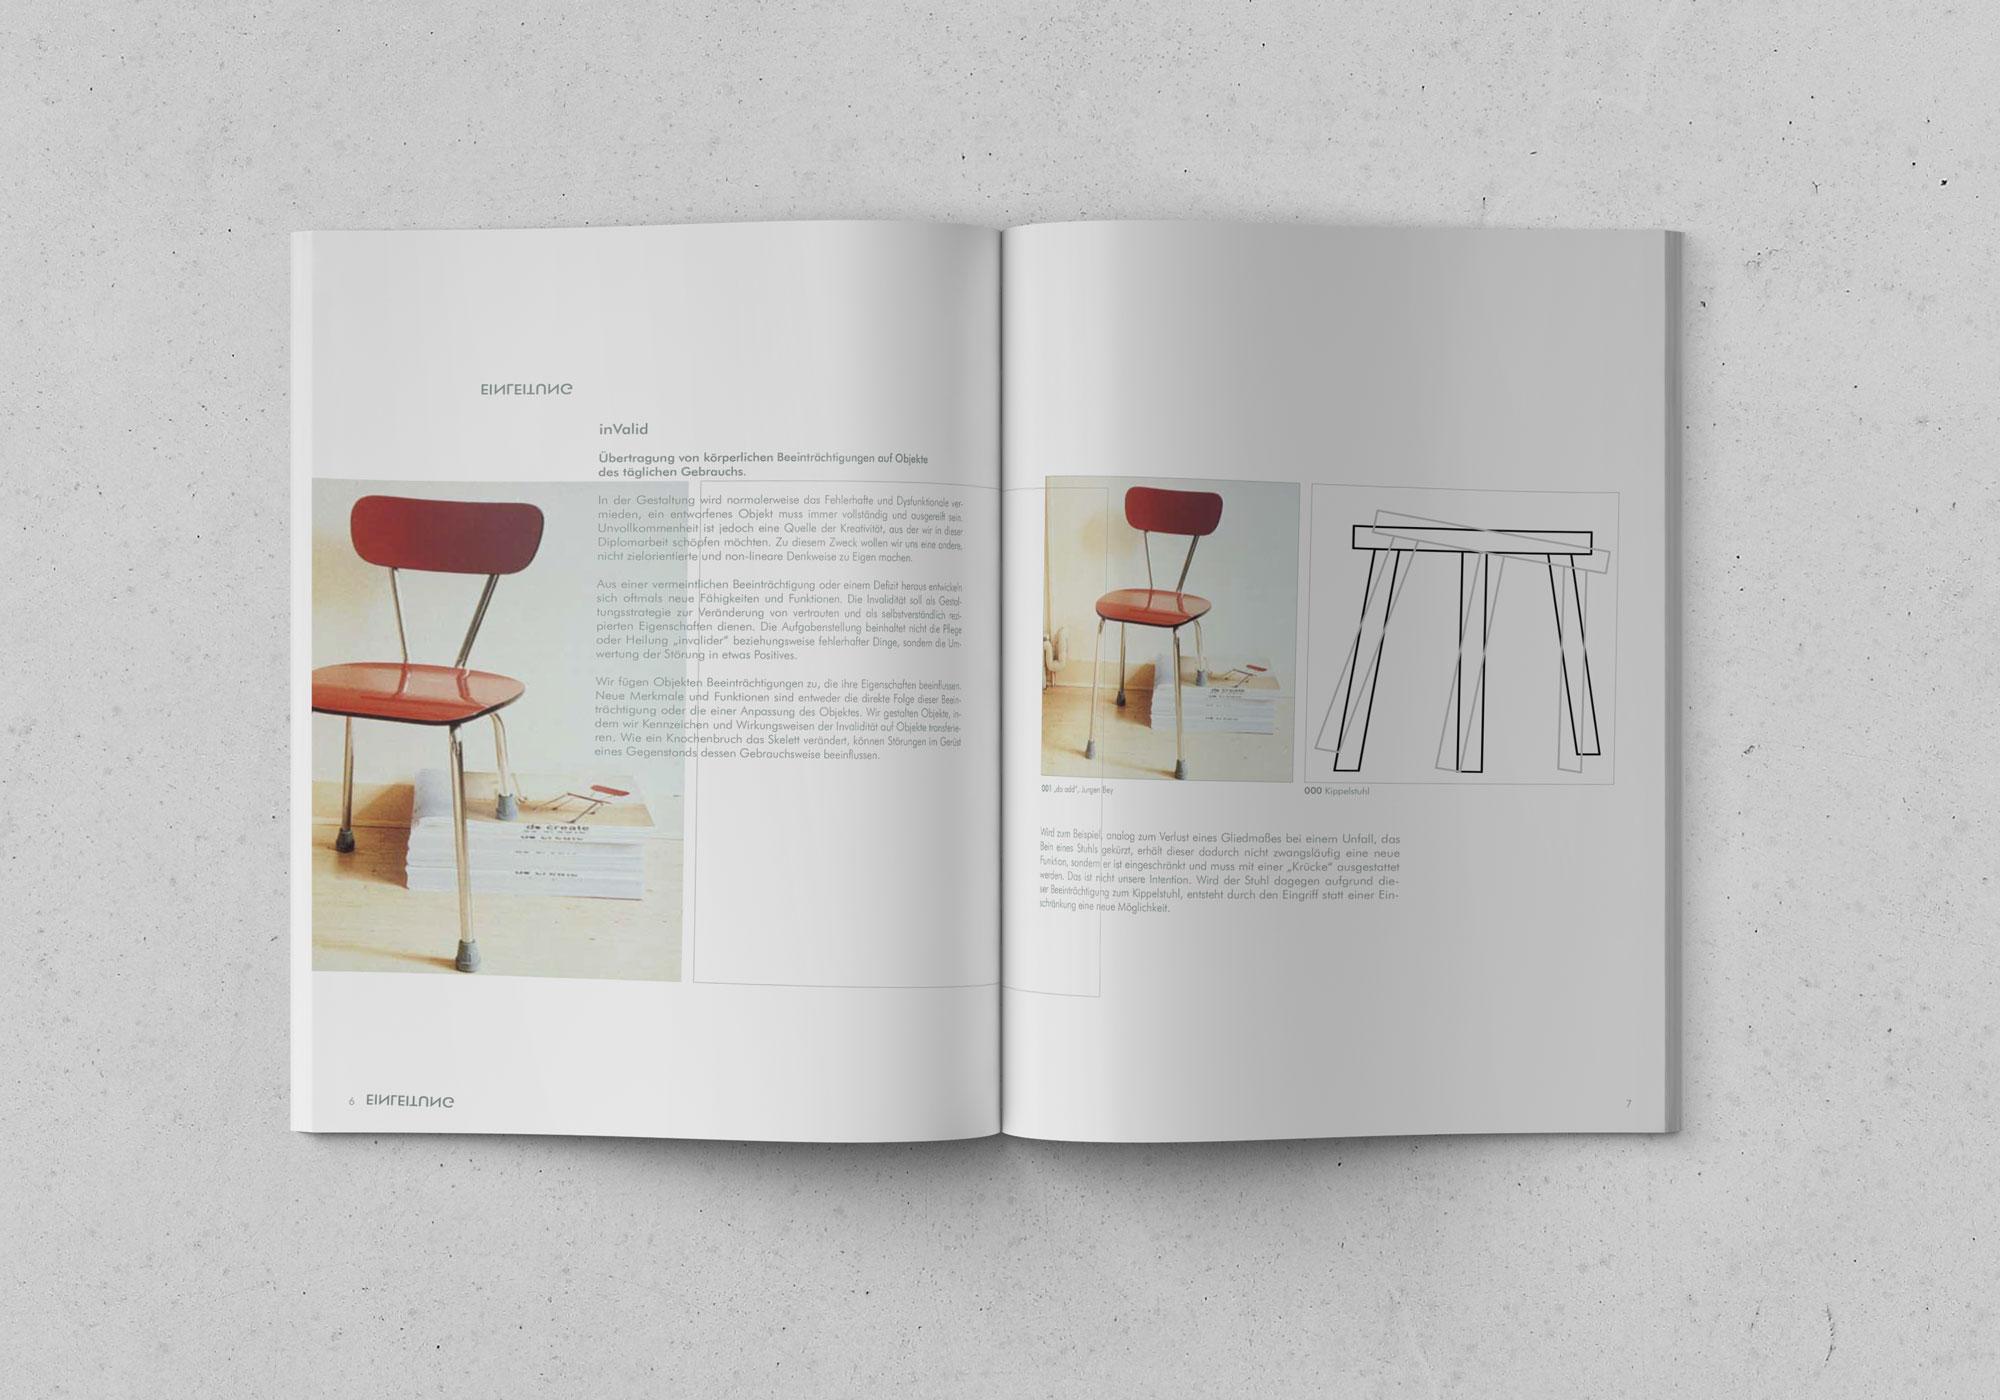 inValid – Nina Farsen | Product- und graphic design